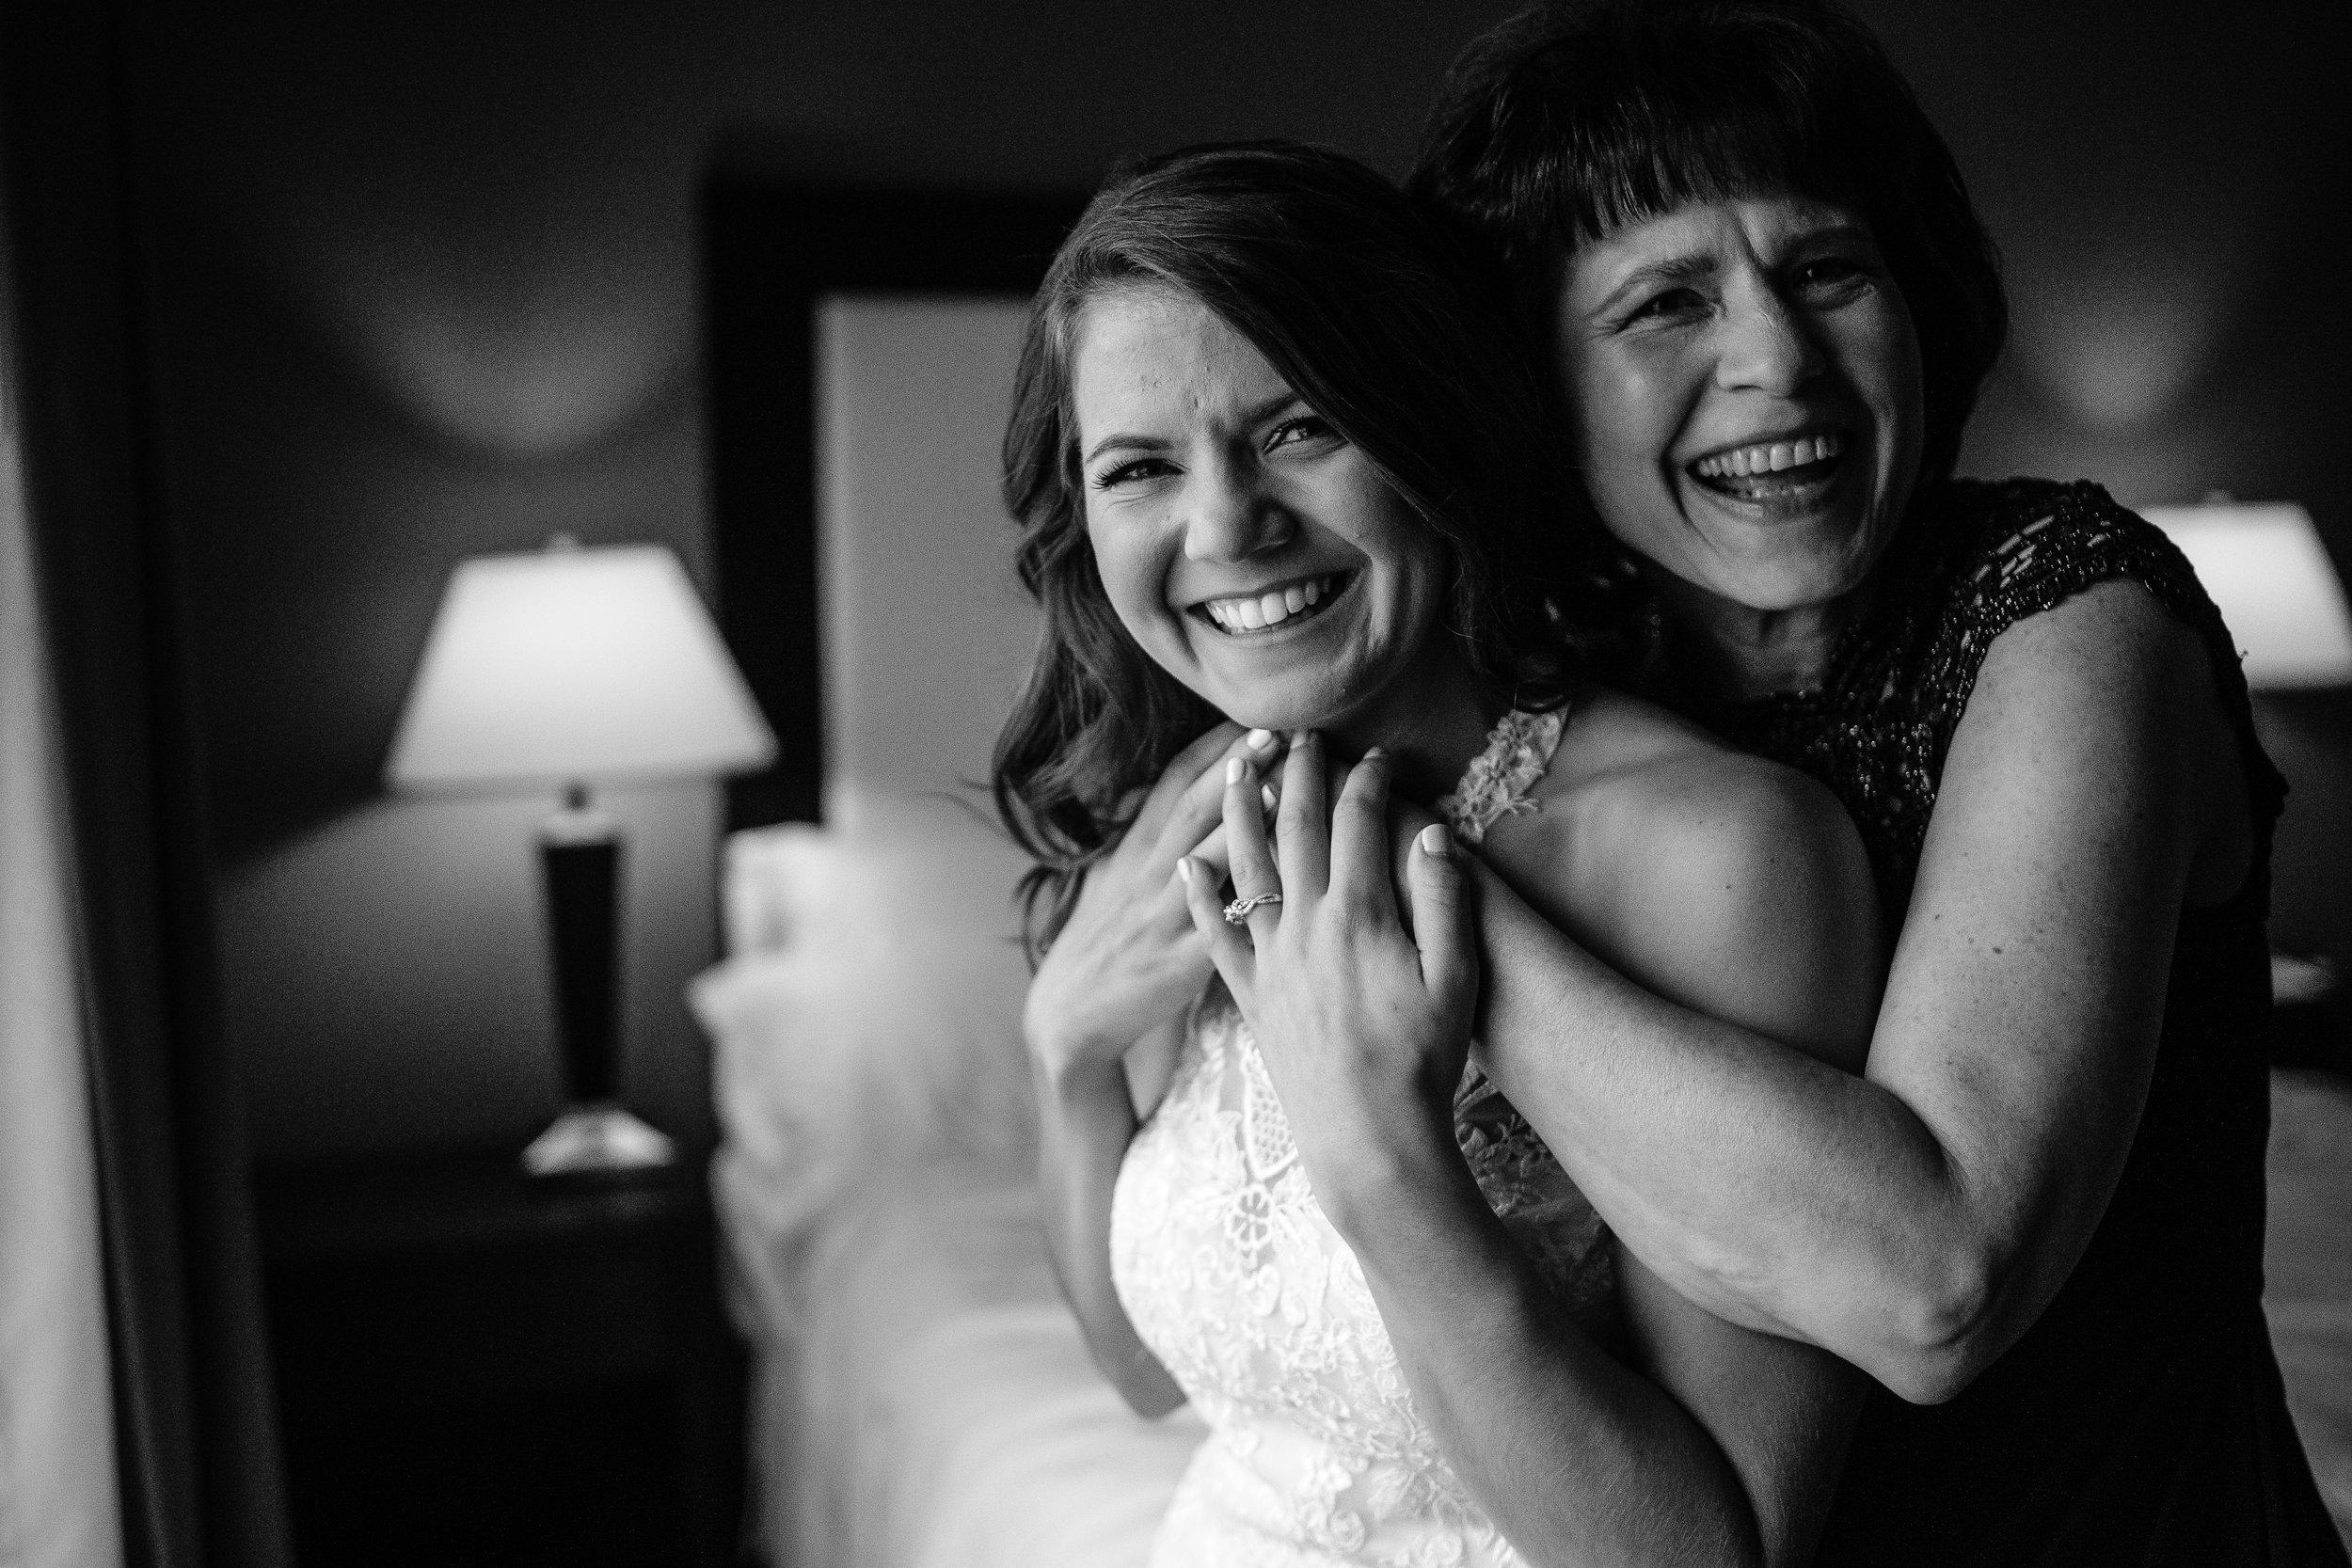 Mom-and-daughter-wedding-pose.jpg